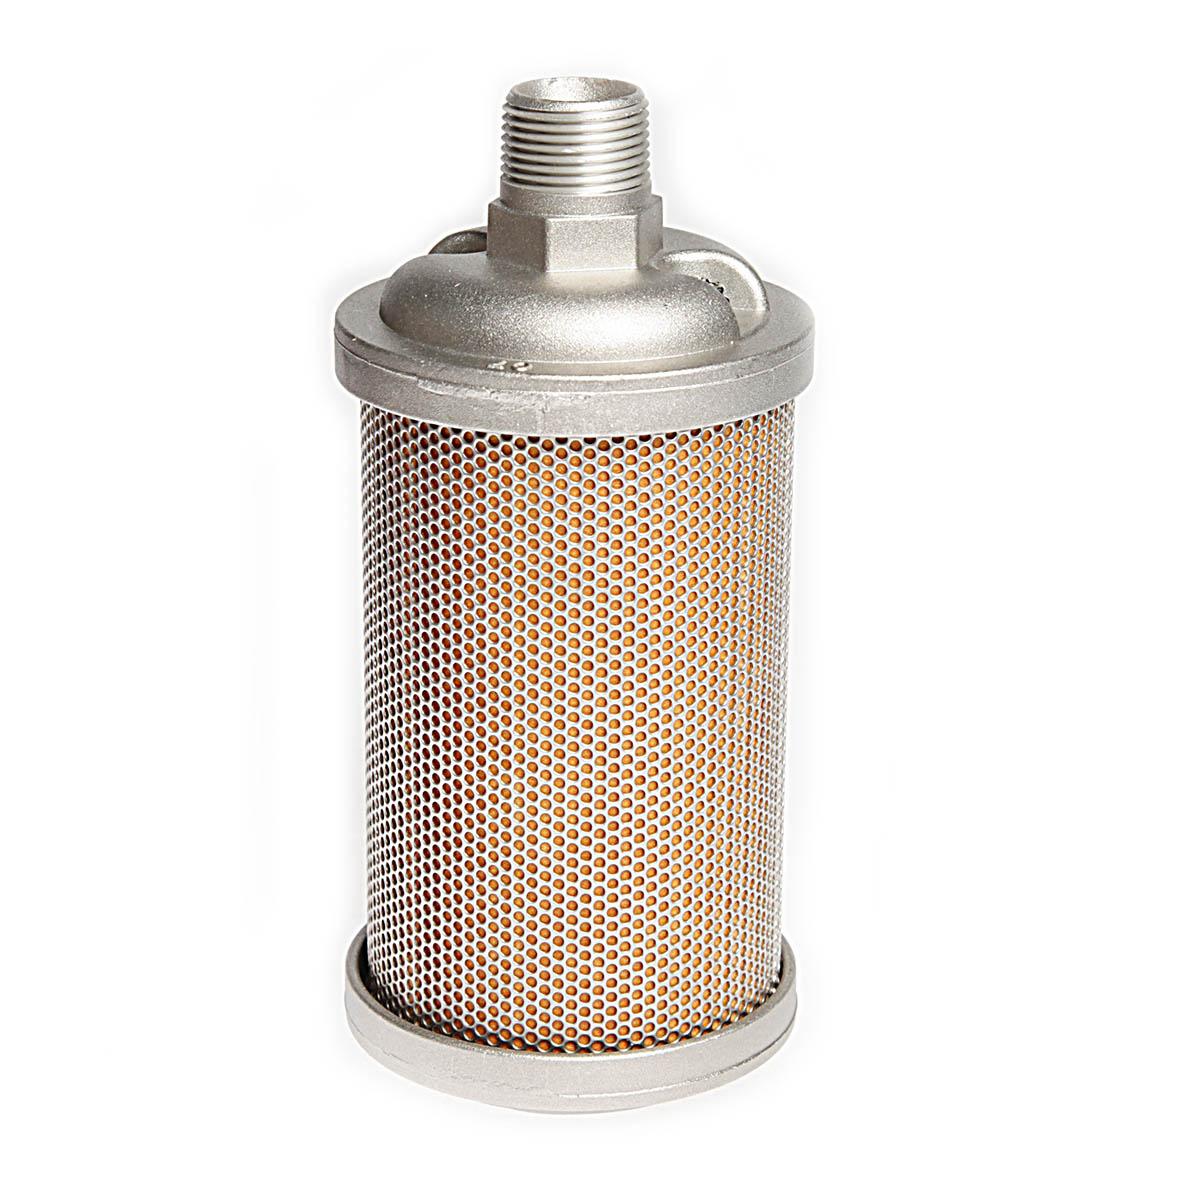 m series air exhaust muffler alwitco